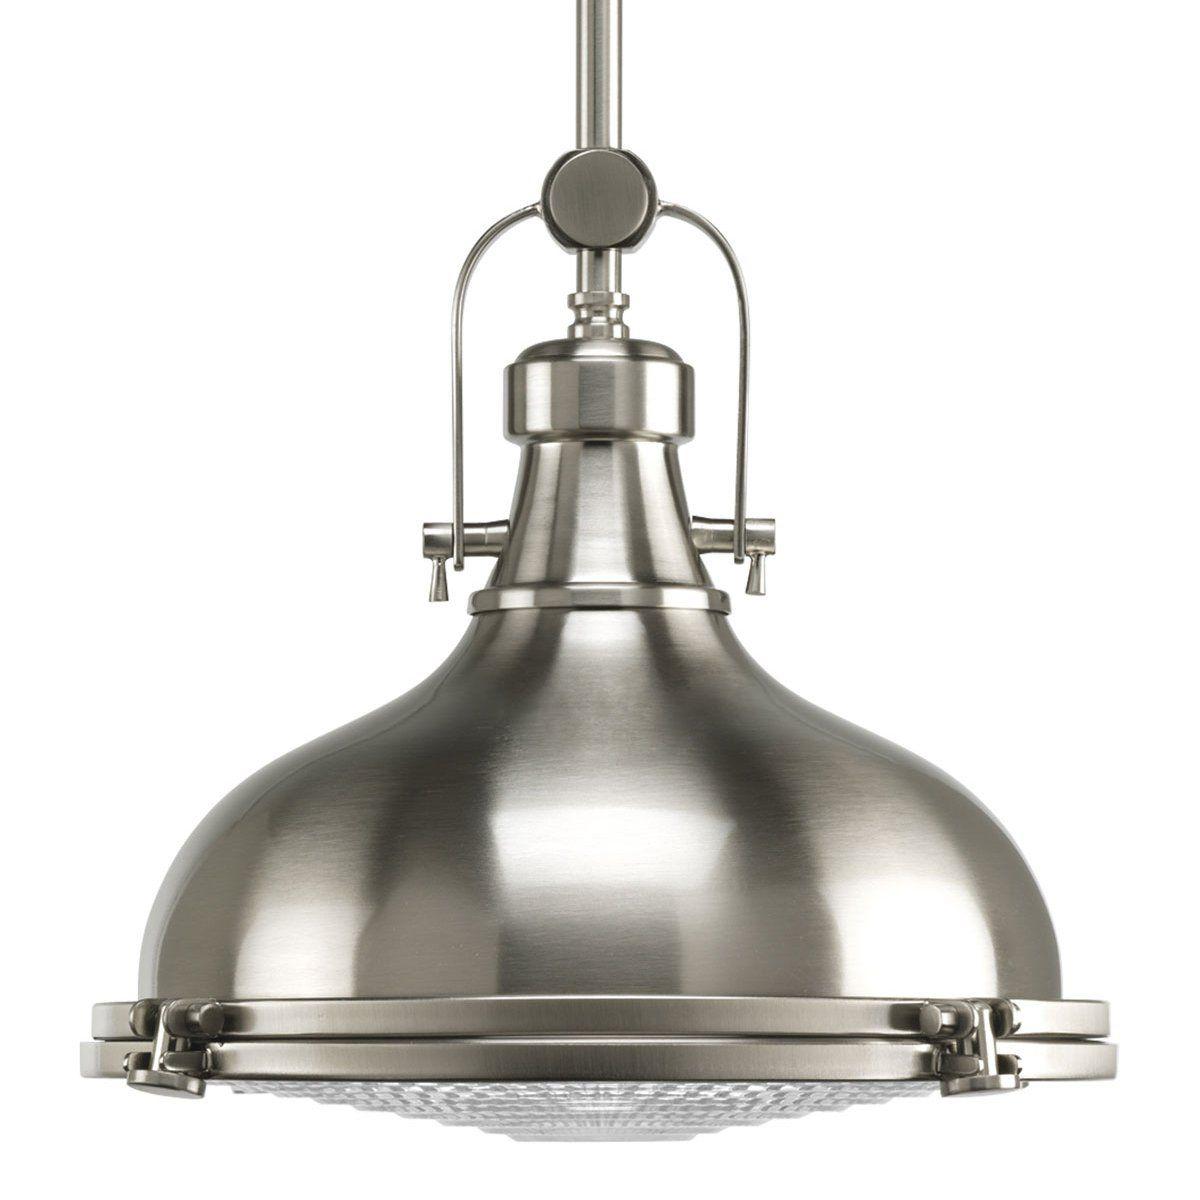 Pregress Lighting 193 Dome Pendant Lighting Pendant Light Fixtures Brushed Nickel Pendant Lights